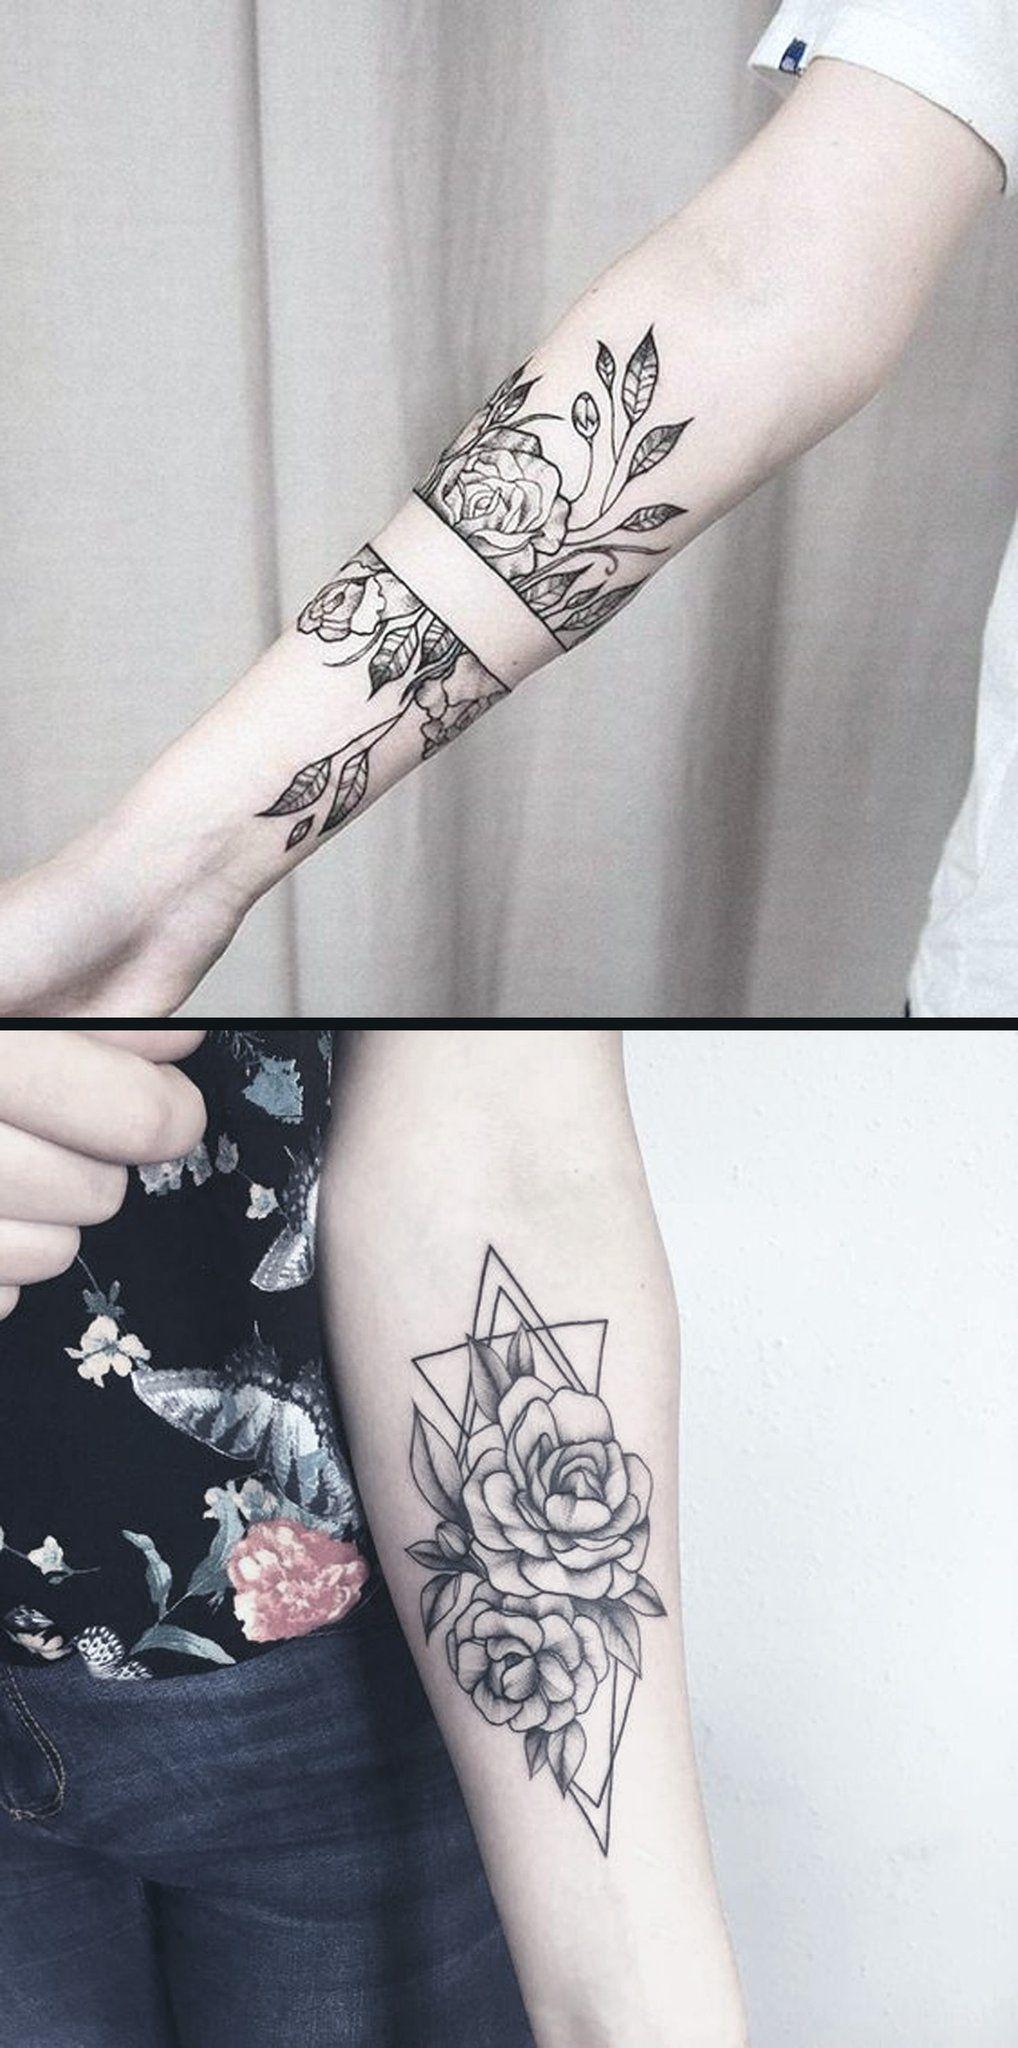 Geometric Diamond Rose Forearm Tattoo Ideas for Women - Black Wild ...